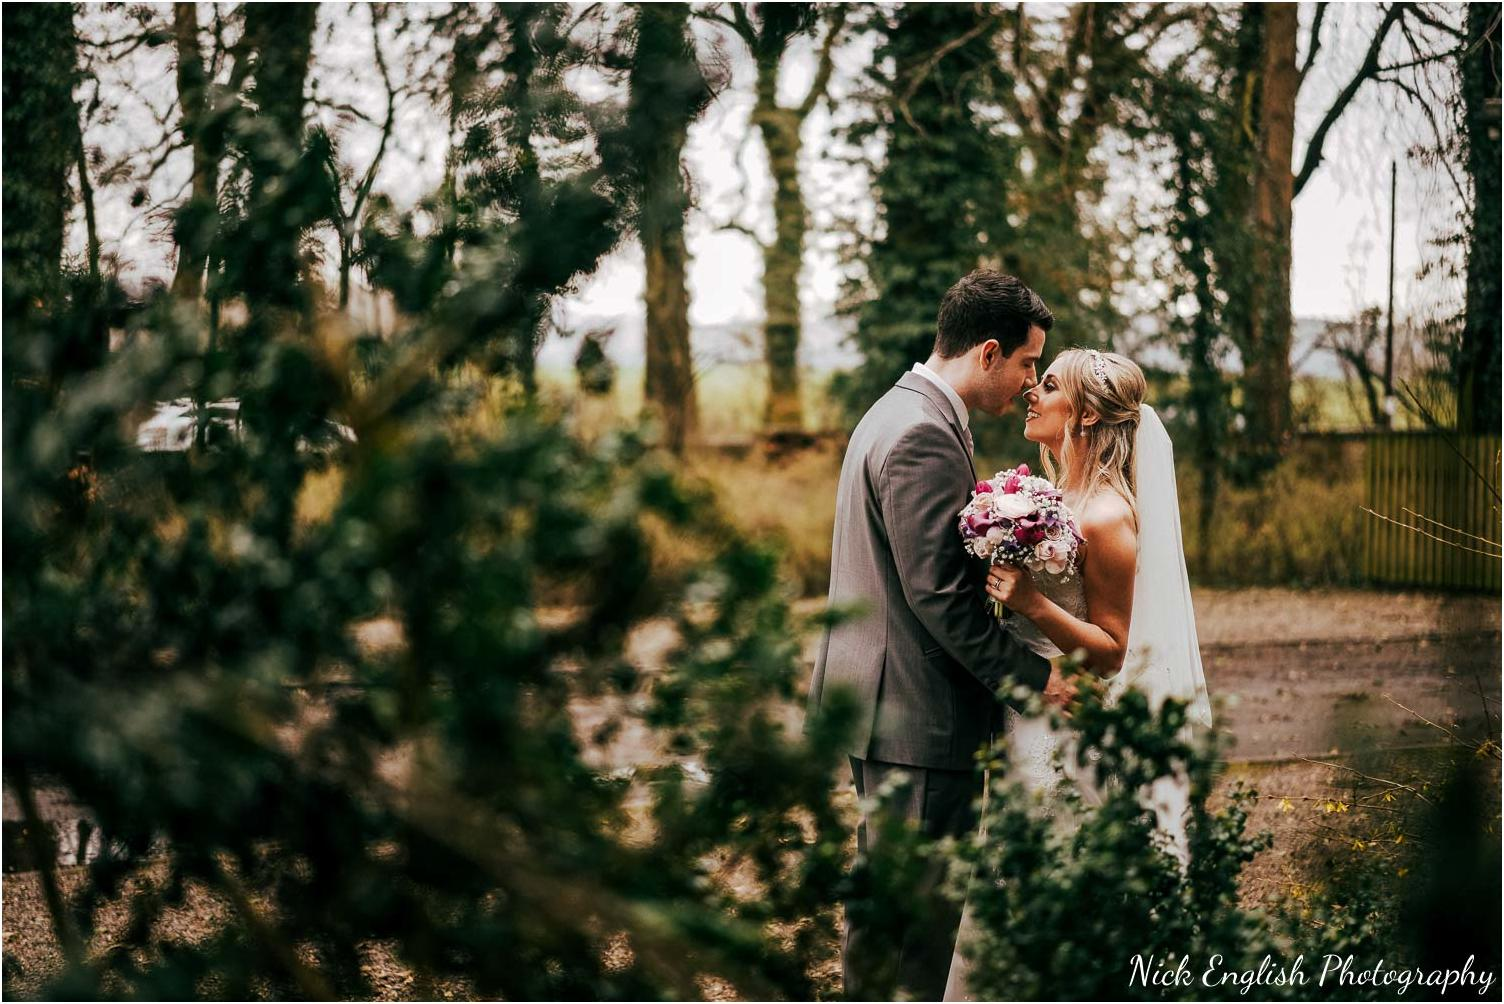 Mitton_Hall_Wedding_Photographer_2018-110.jpg